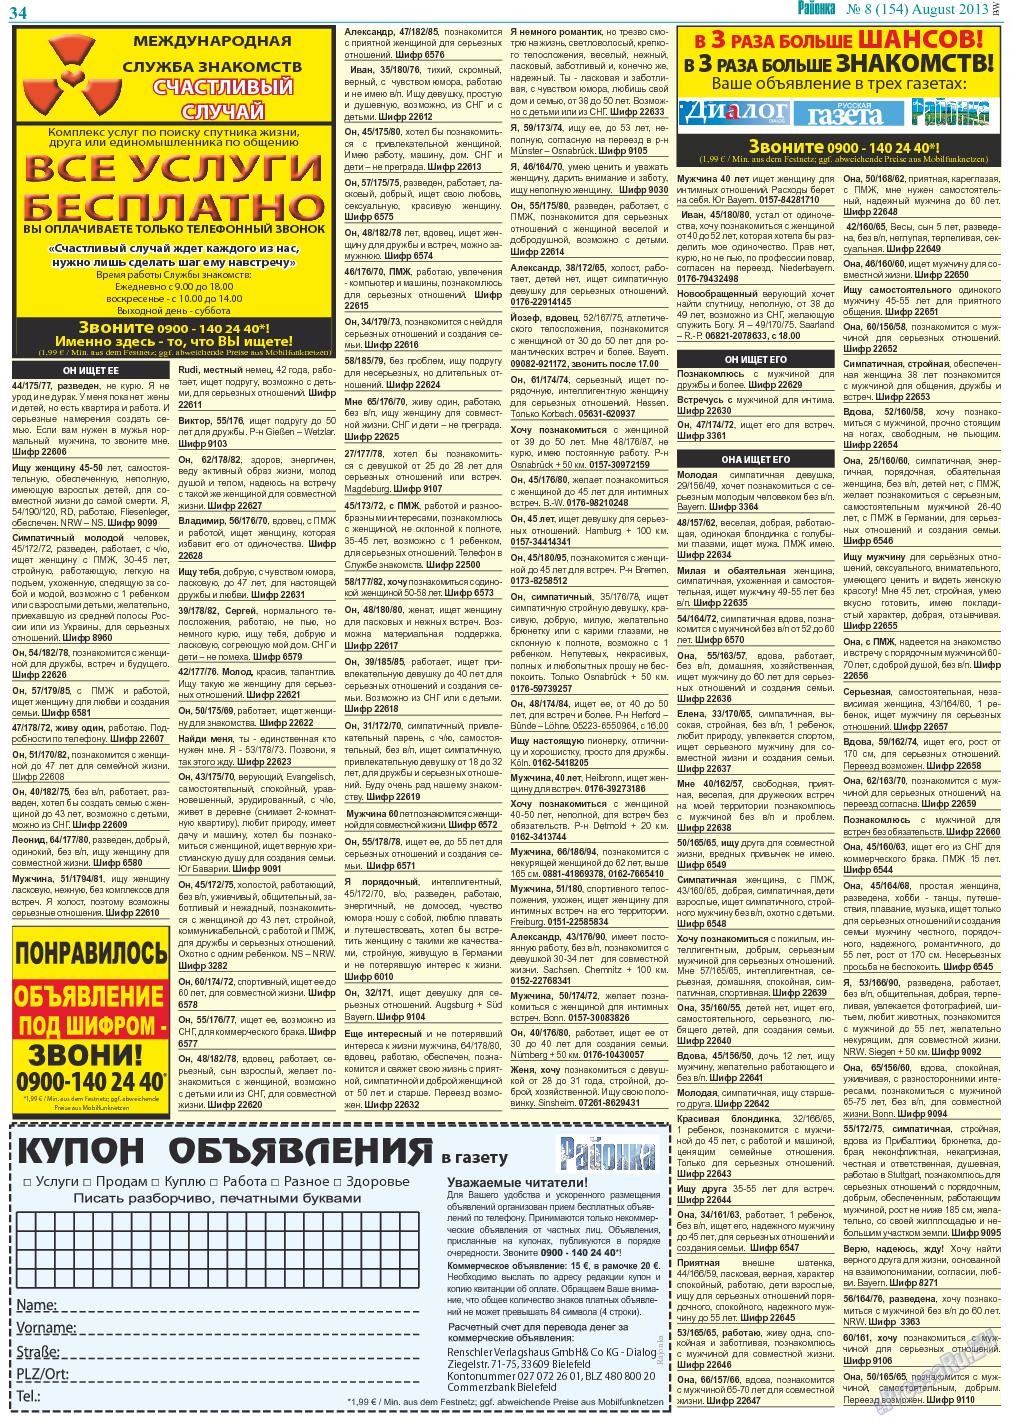 Газета служба знакомств днепропетровск